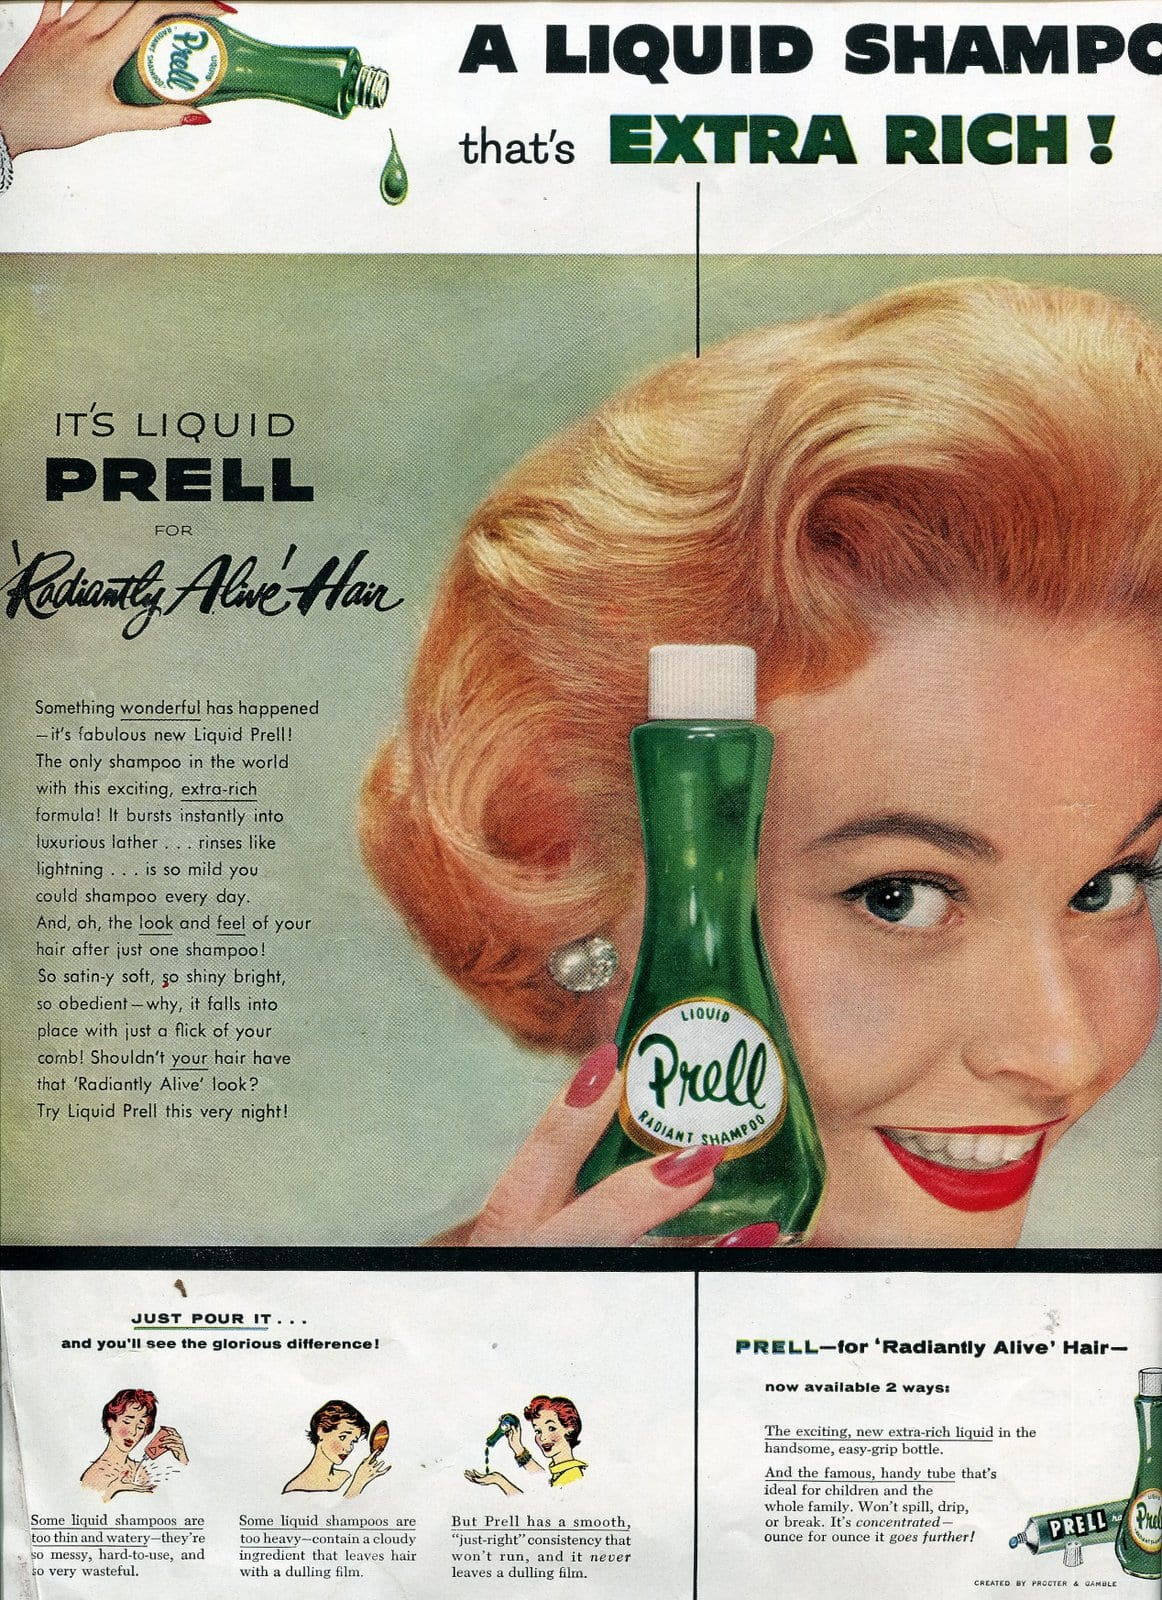 1955 Prell shampoo